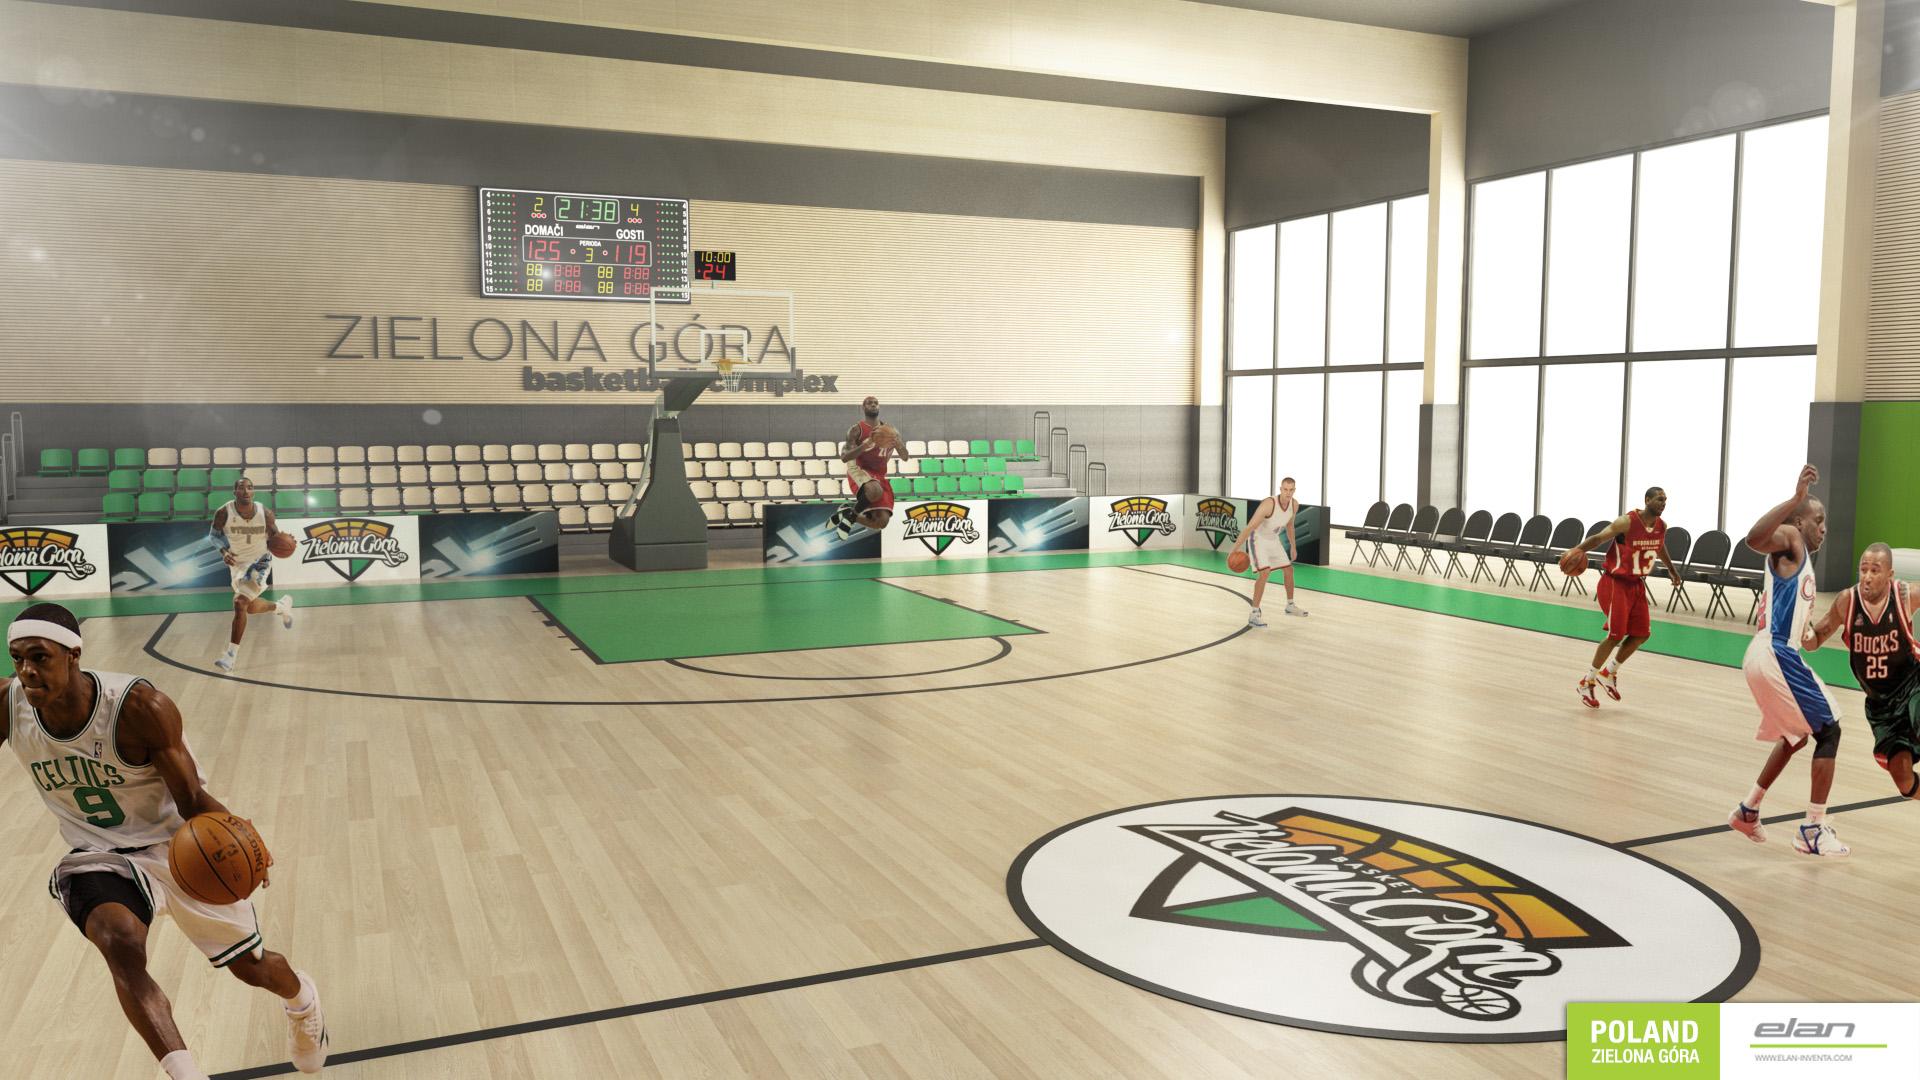 ZIELONA GORA - interior - MAIN HALL 2 - 0004